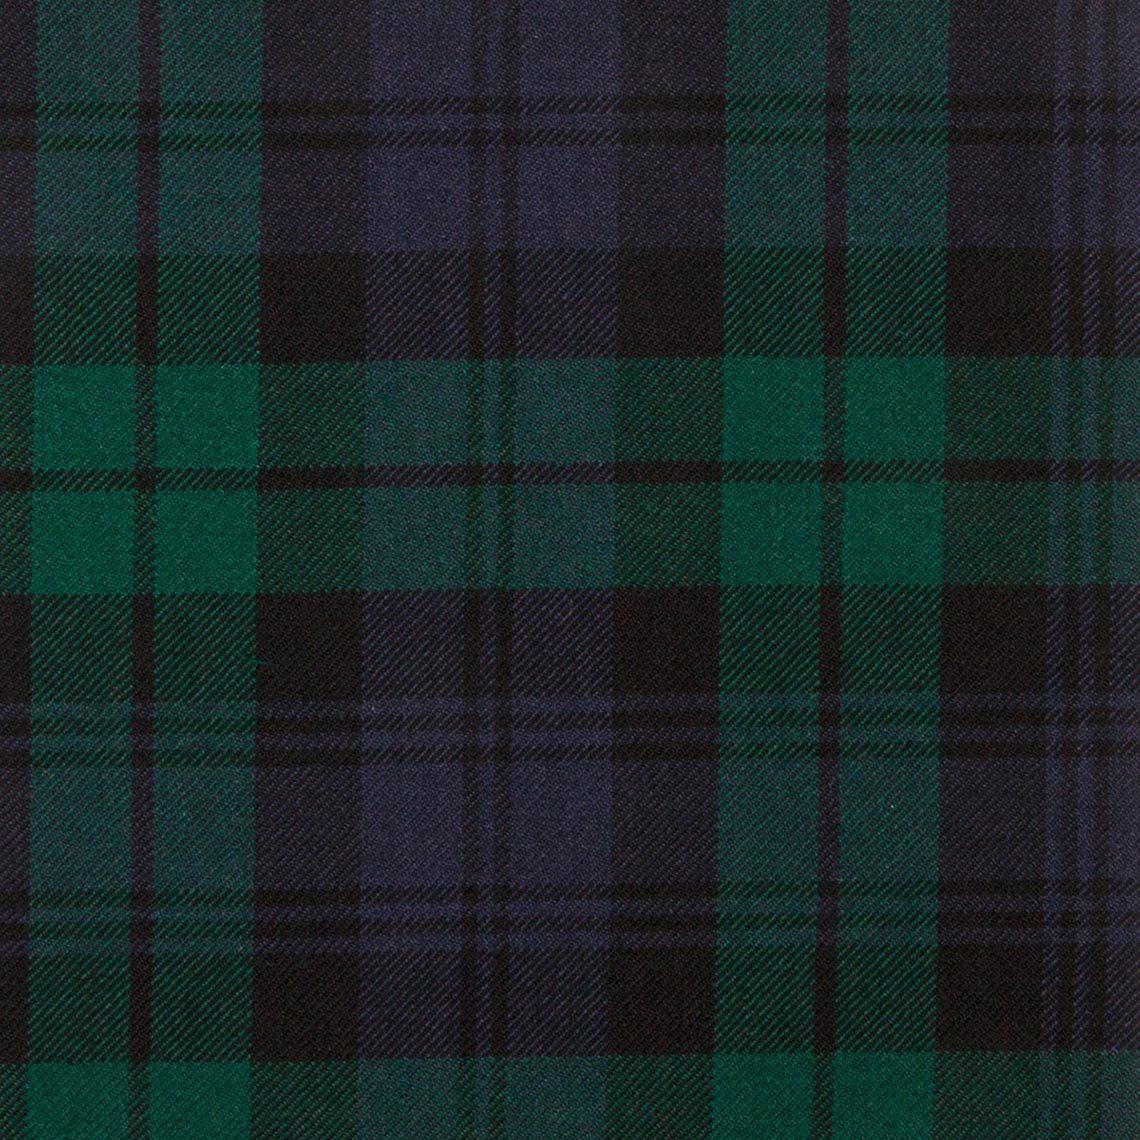 Sutherland Hunting (Modern) Kilt